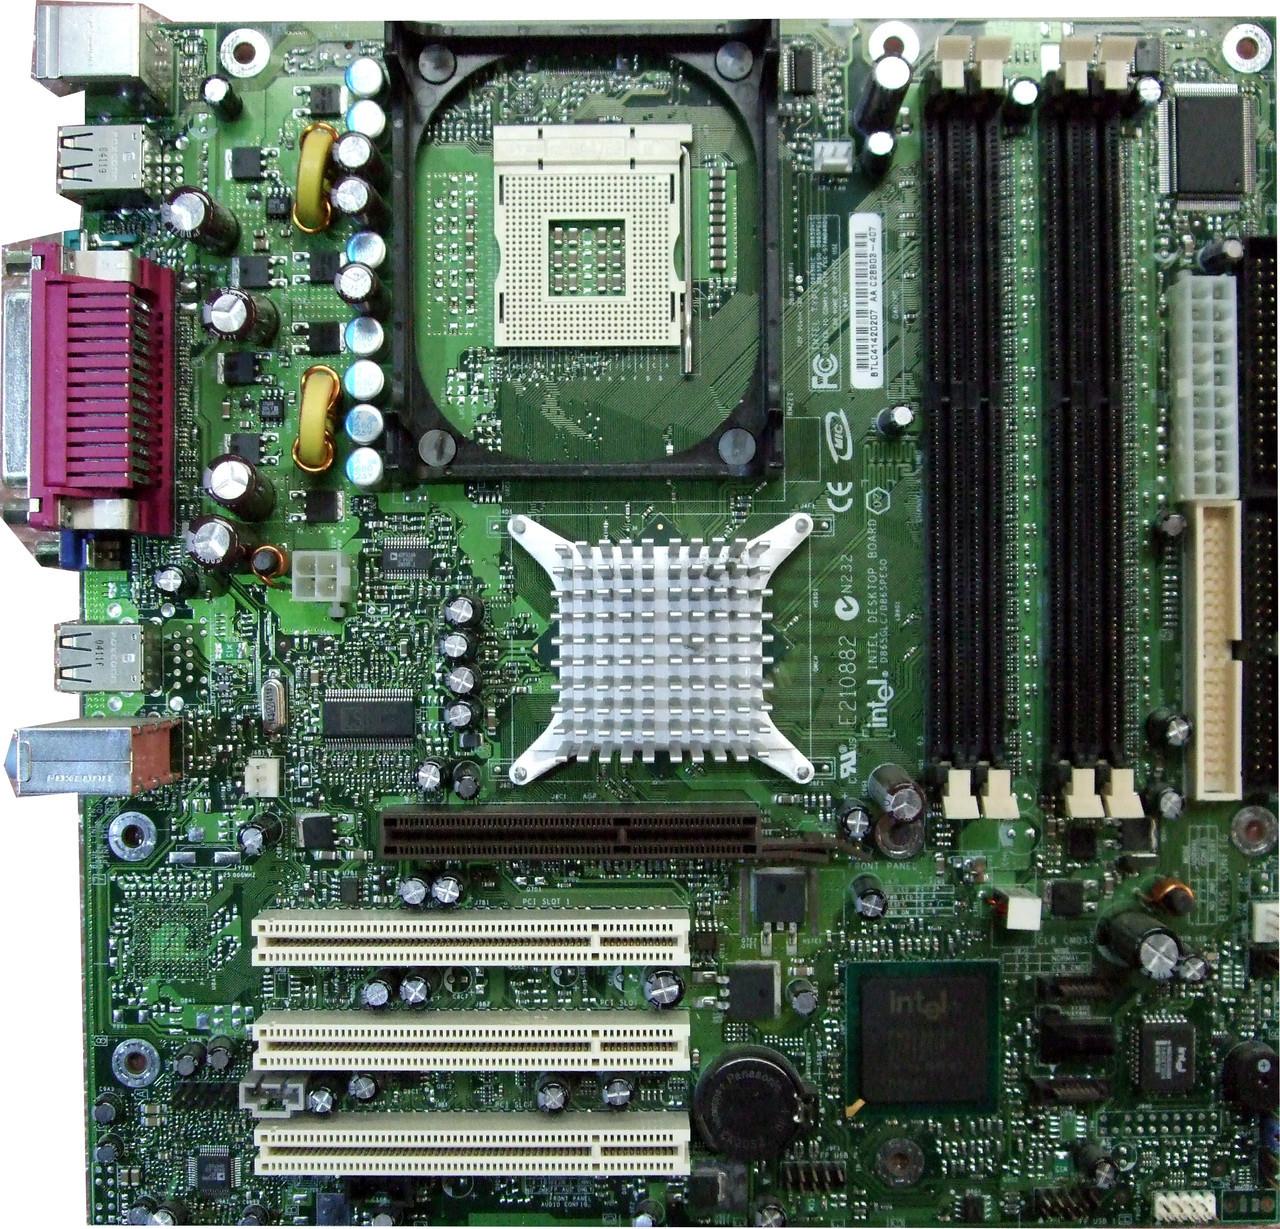 INTEL DESKTOP BOARD D865GLC LAN DRIVERS FOR PC